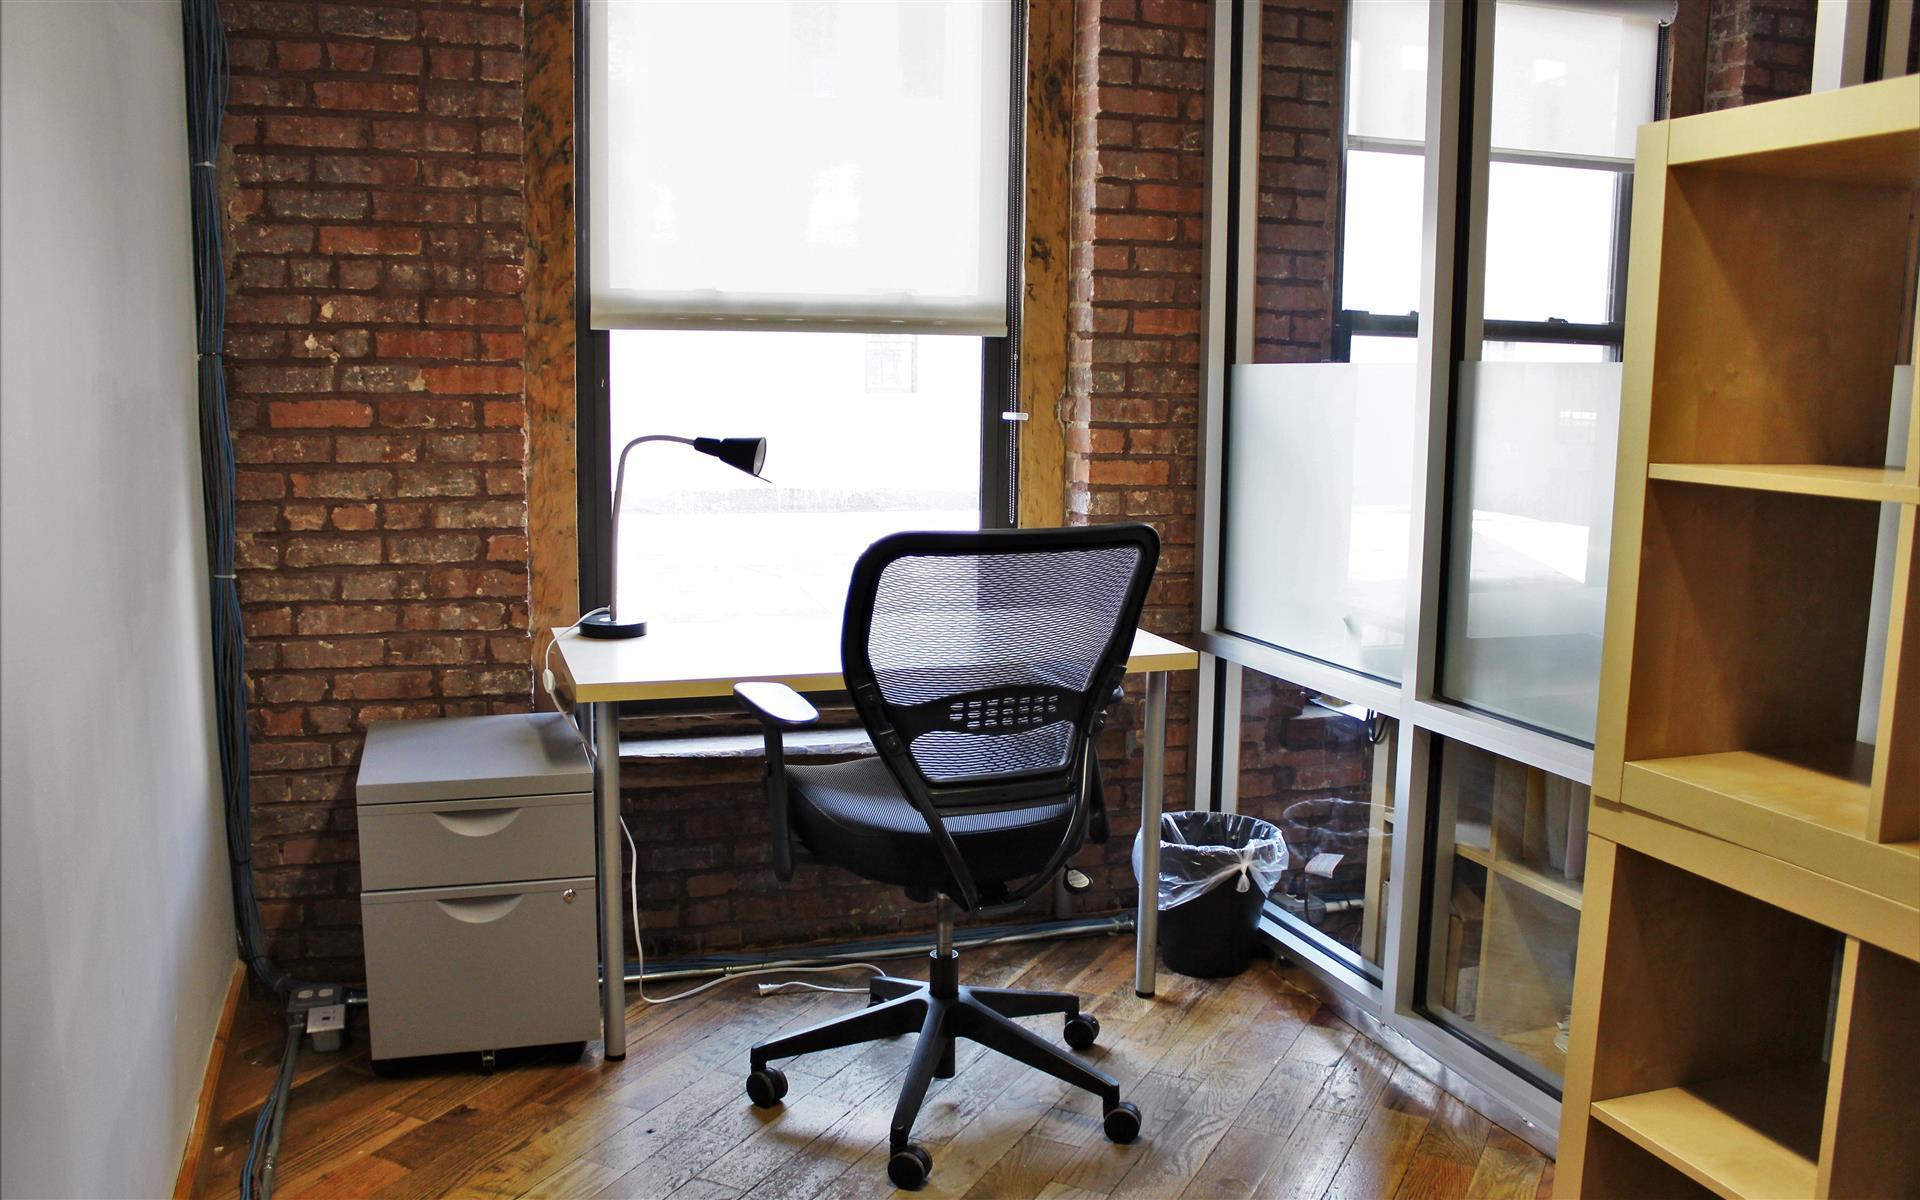 Green Desk - 195 Plymouth Street - Green Desk - 195 Plymouth Street